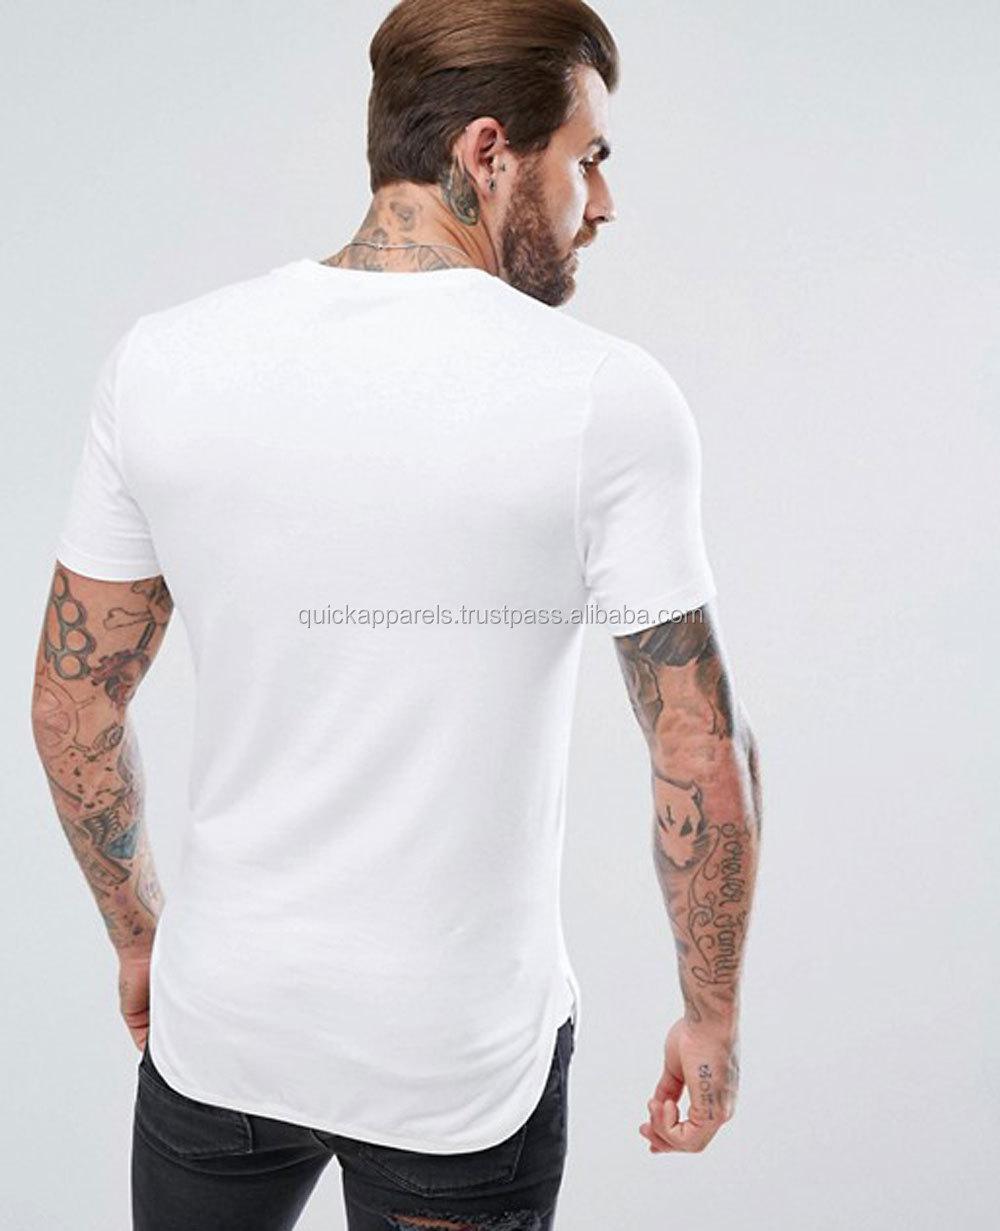 blank urban apparel urban clothing manufacturers